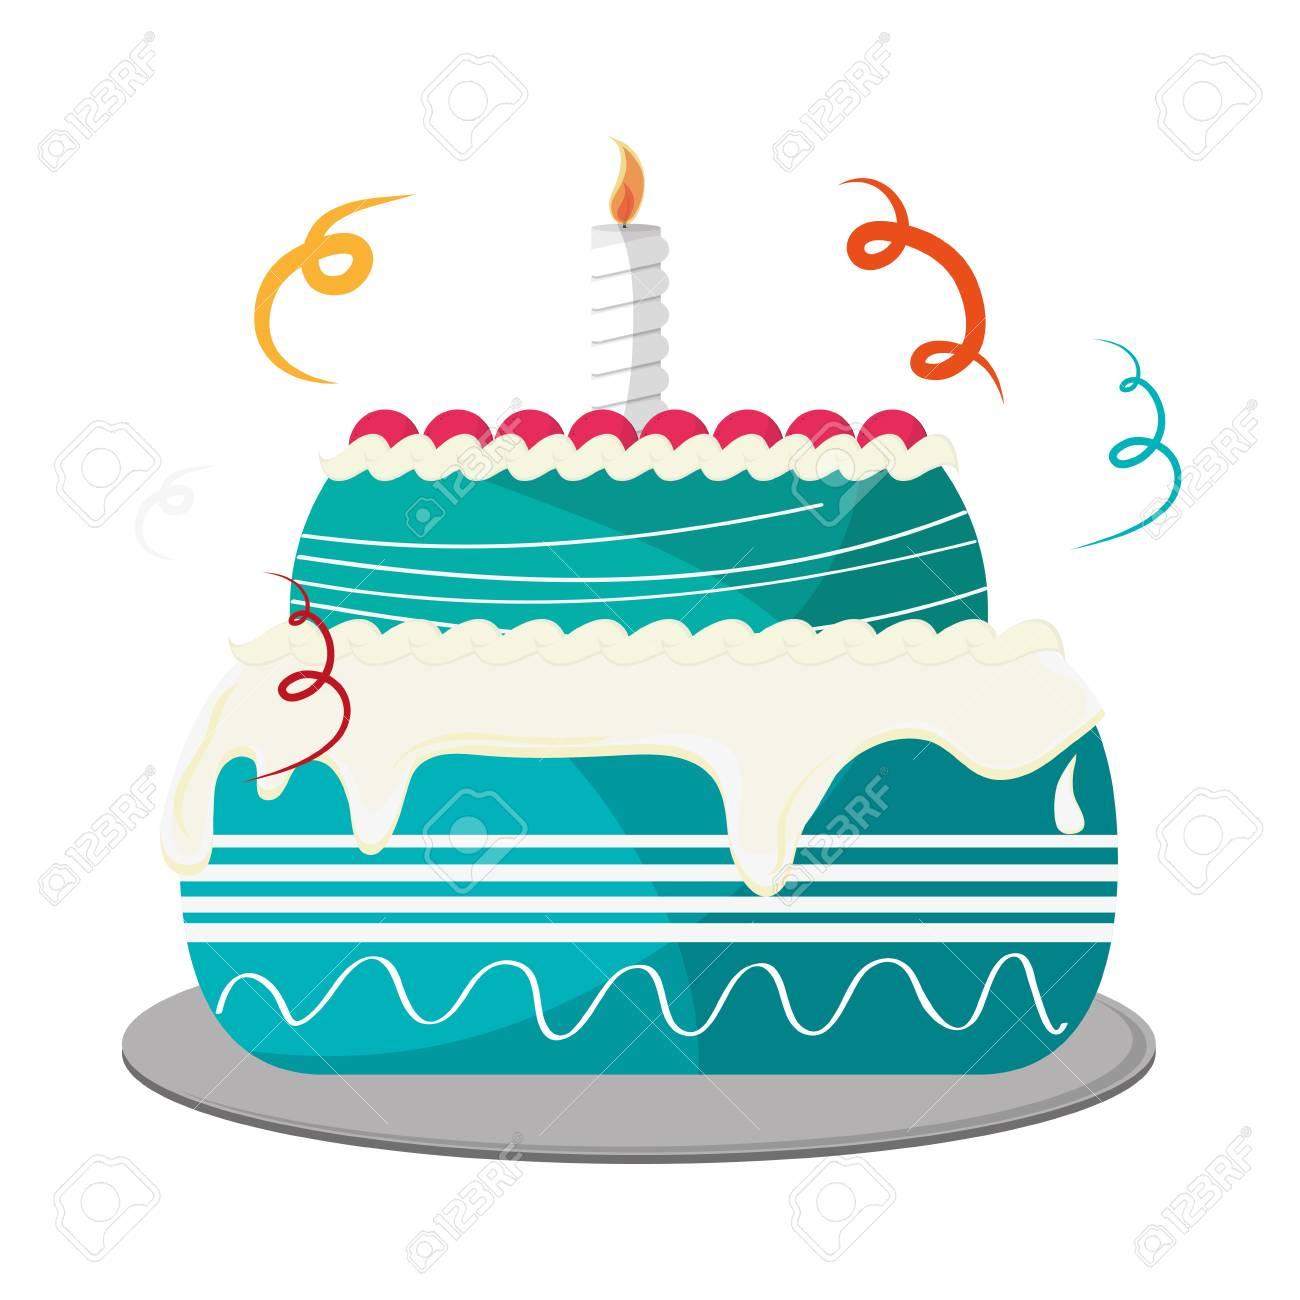 Flat Design Birthday Cake Icon Vector Illustration Royalty Free